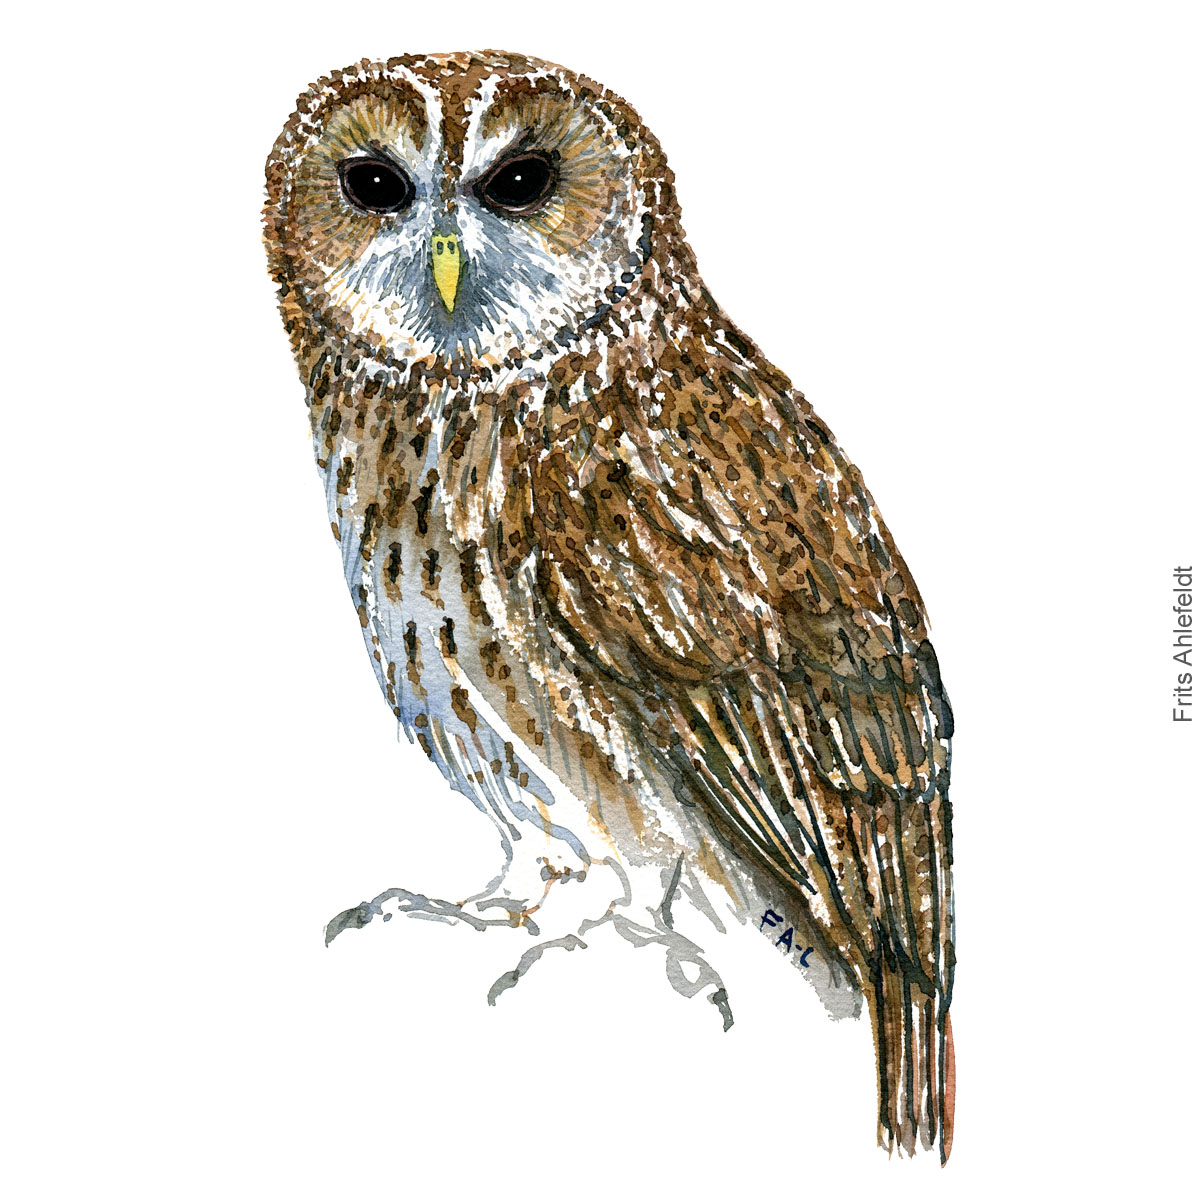 Natugle - Tawny owl - Bird watercolor painting. Artwork by Frits Ahlefeldt. Fugle akvarel